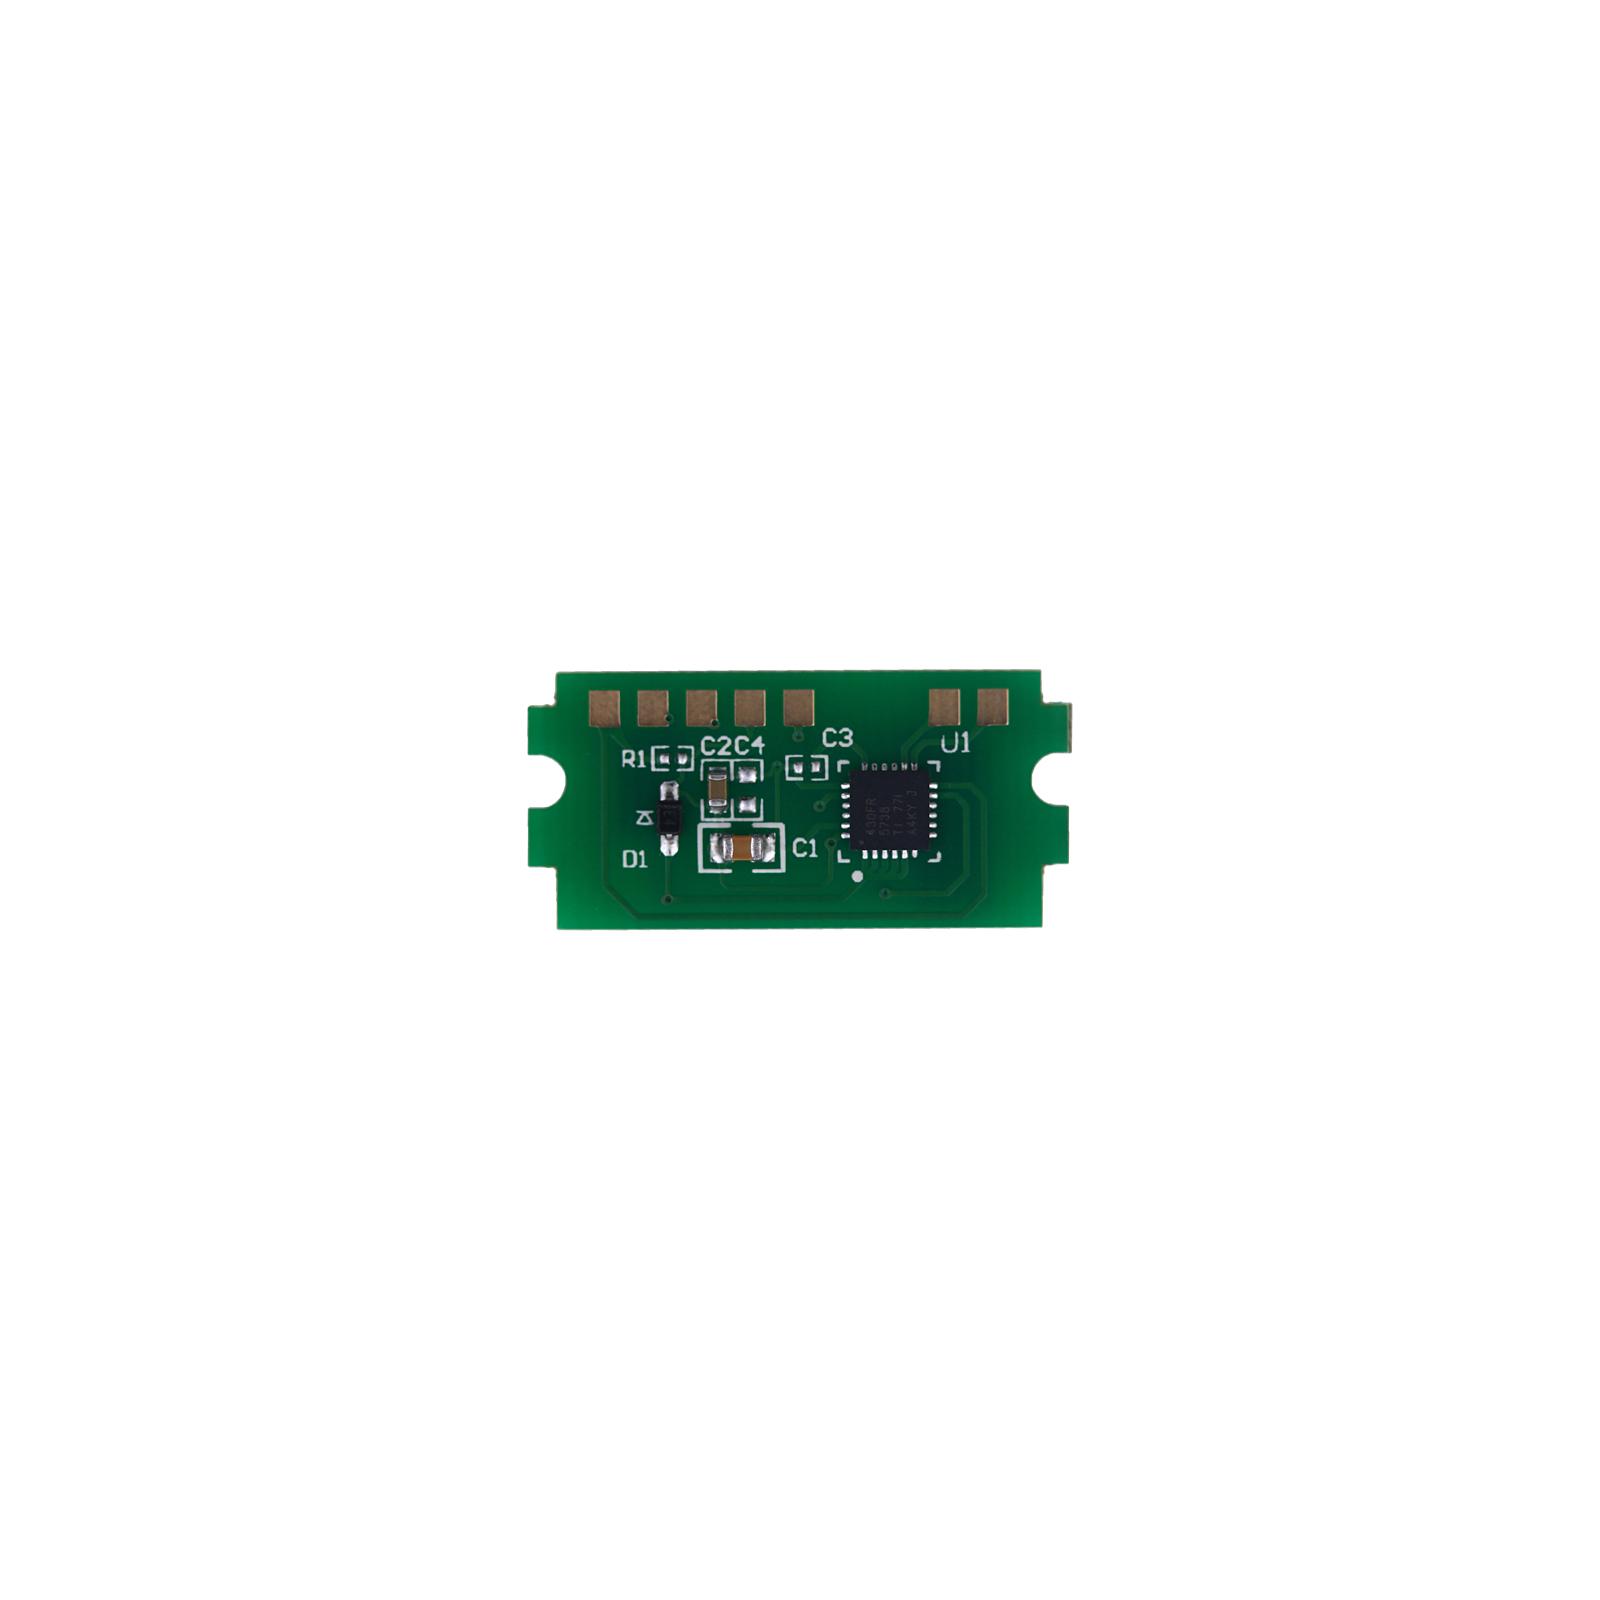 Чип для картриджа Kyocera TK-1160 (EU) 7.2k Static Control (TK1160CP-EU)